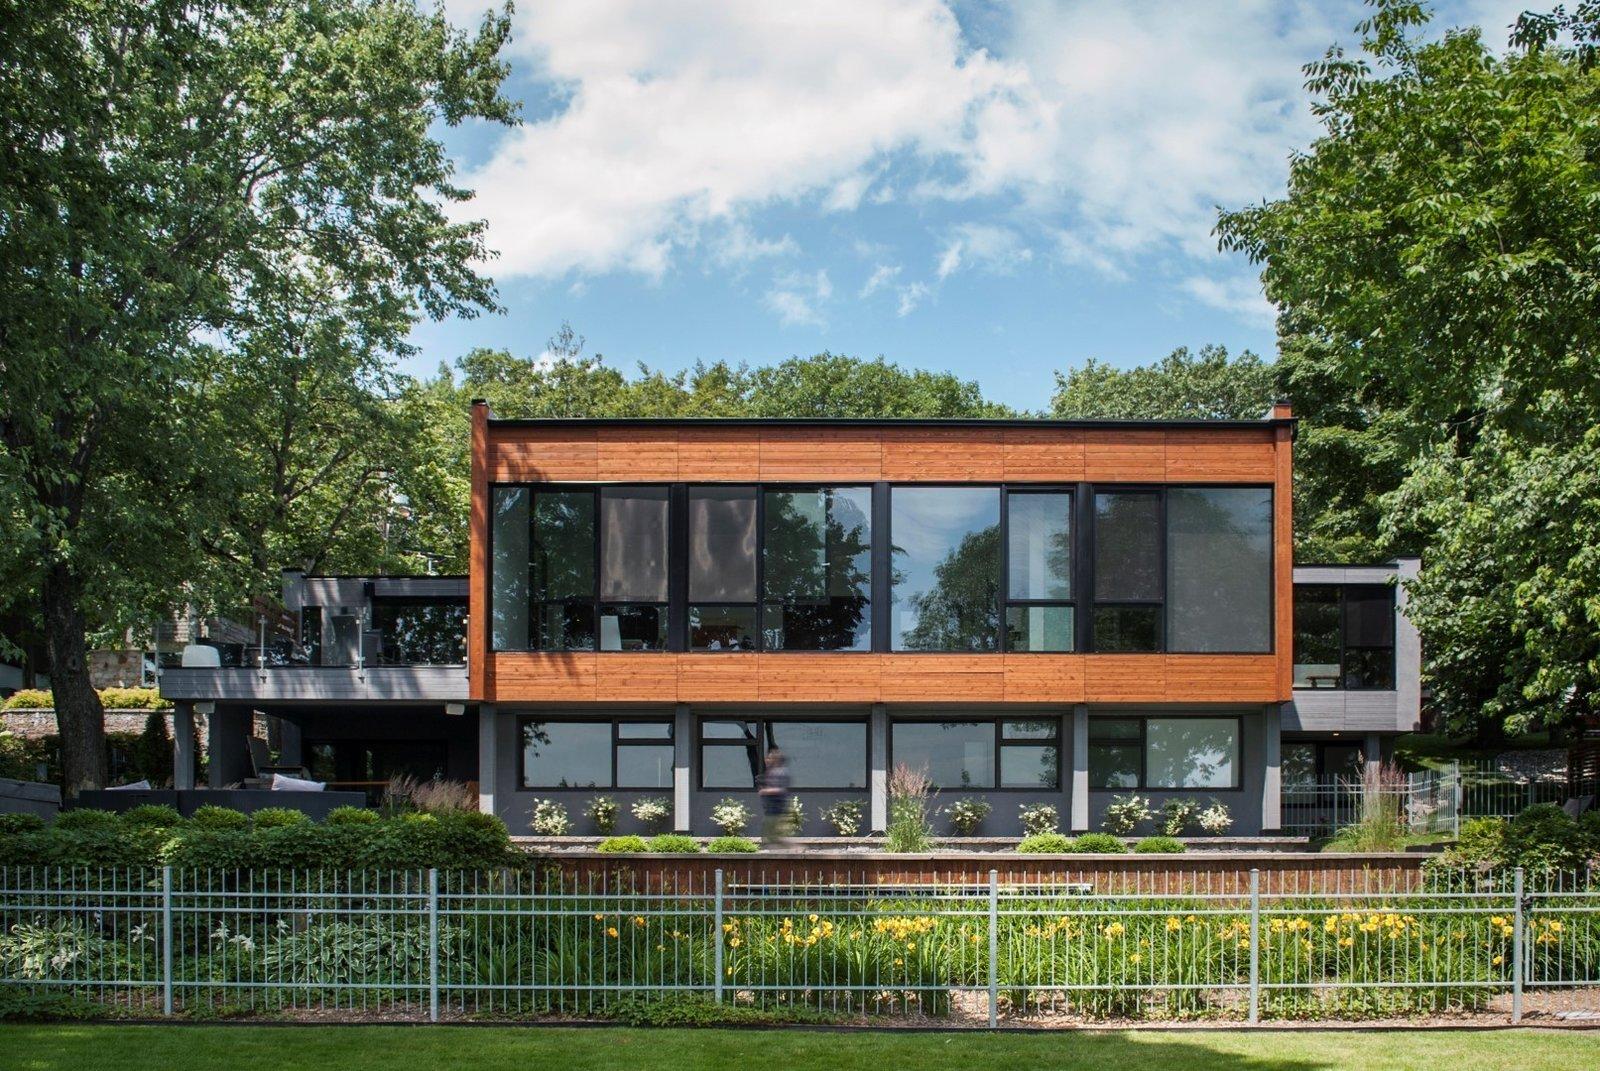 Back yard at Rue de l'Anse residence - PARKA Architecture & Design - Quebec city, Canada  Rue de l'Anse residence by PARKA - Architecture & Design